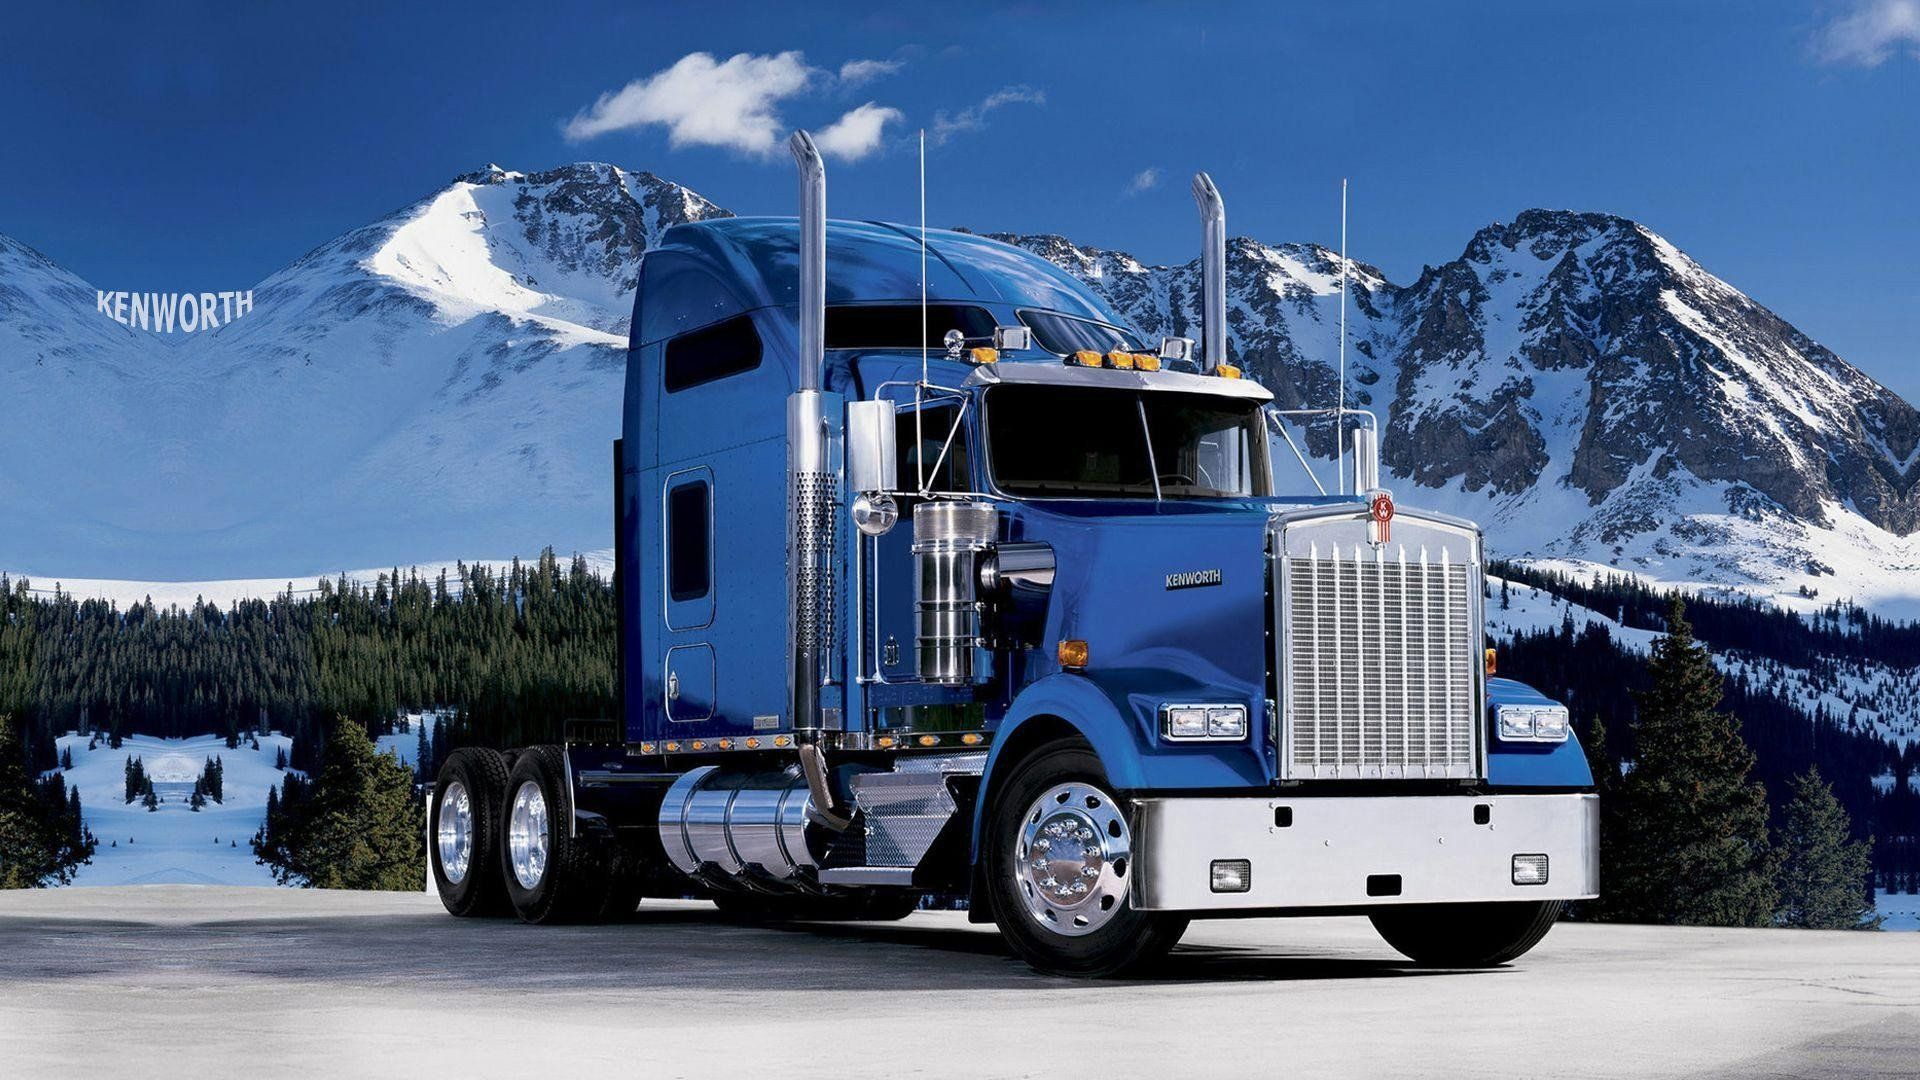 Sterling Truck Wallpaper Hd For Desktop In High Resolutions 1600